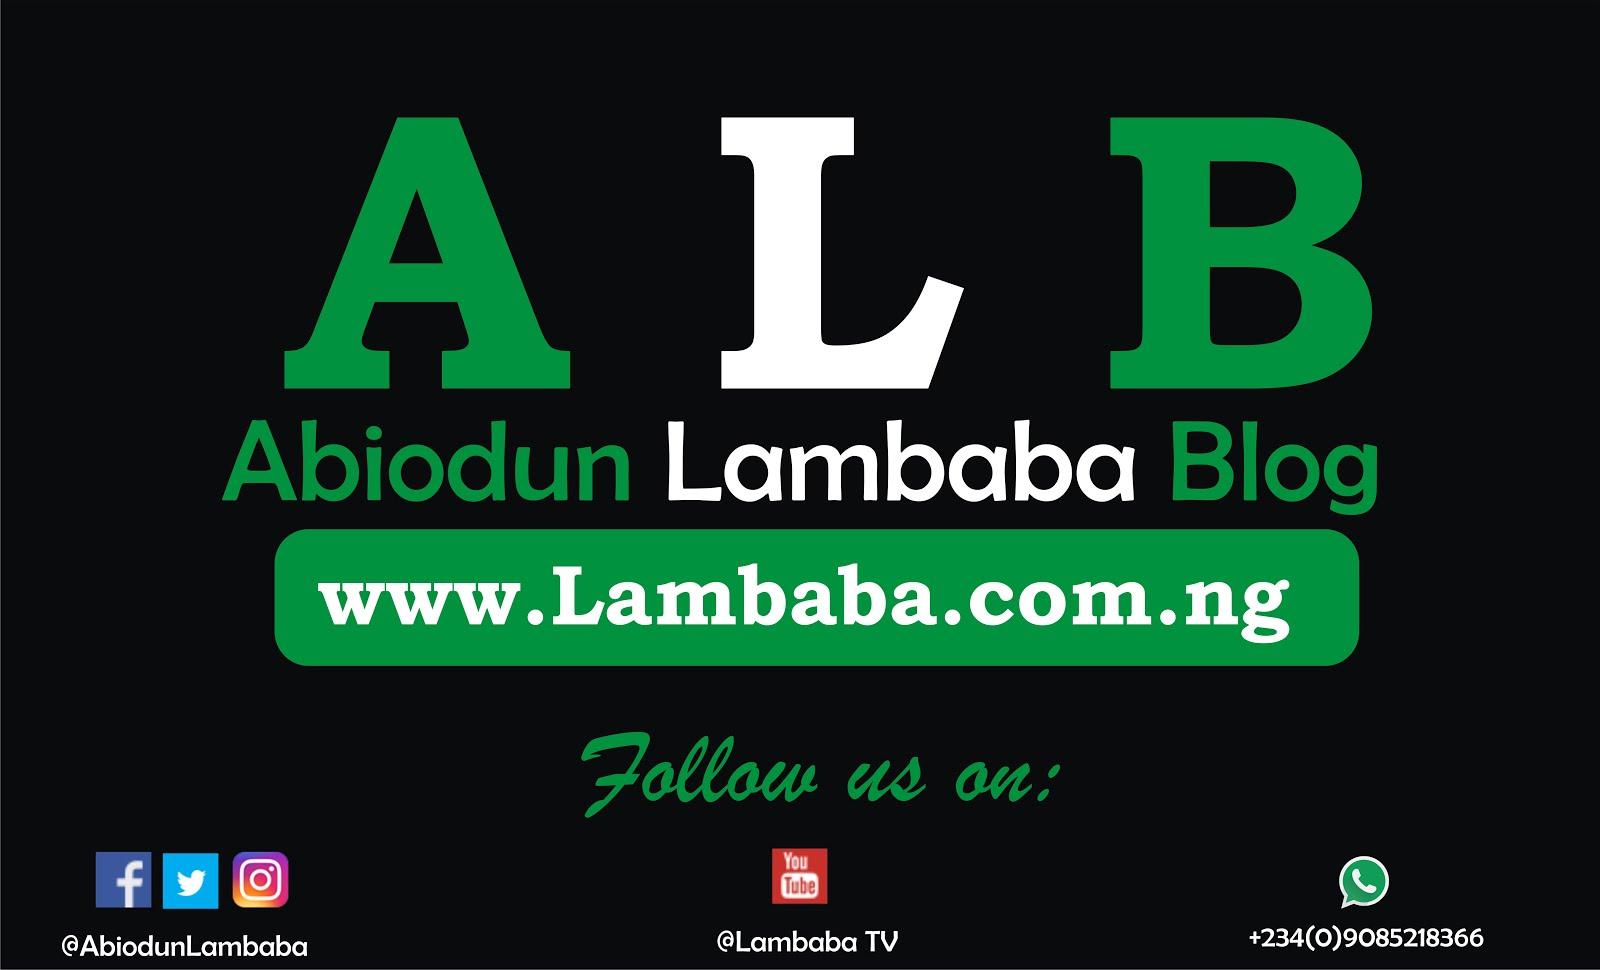 Abiodun Lambaba Blog